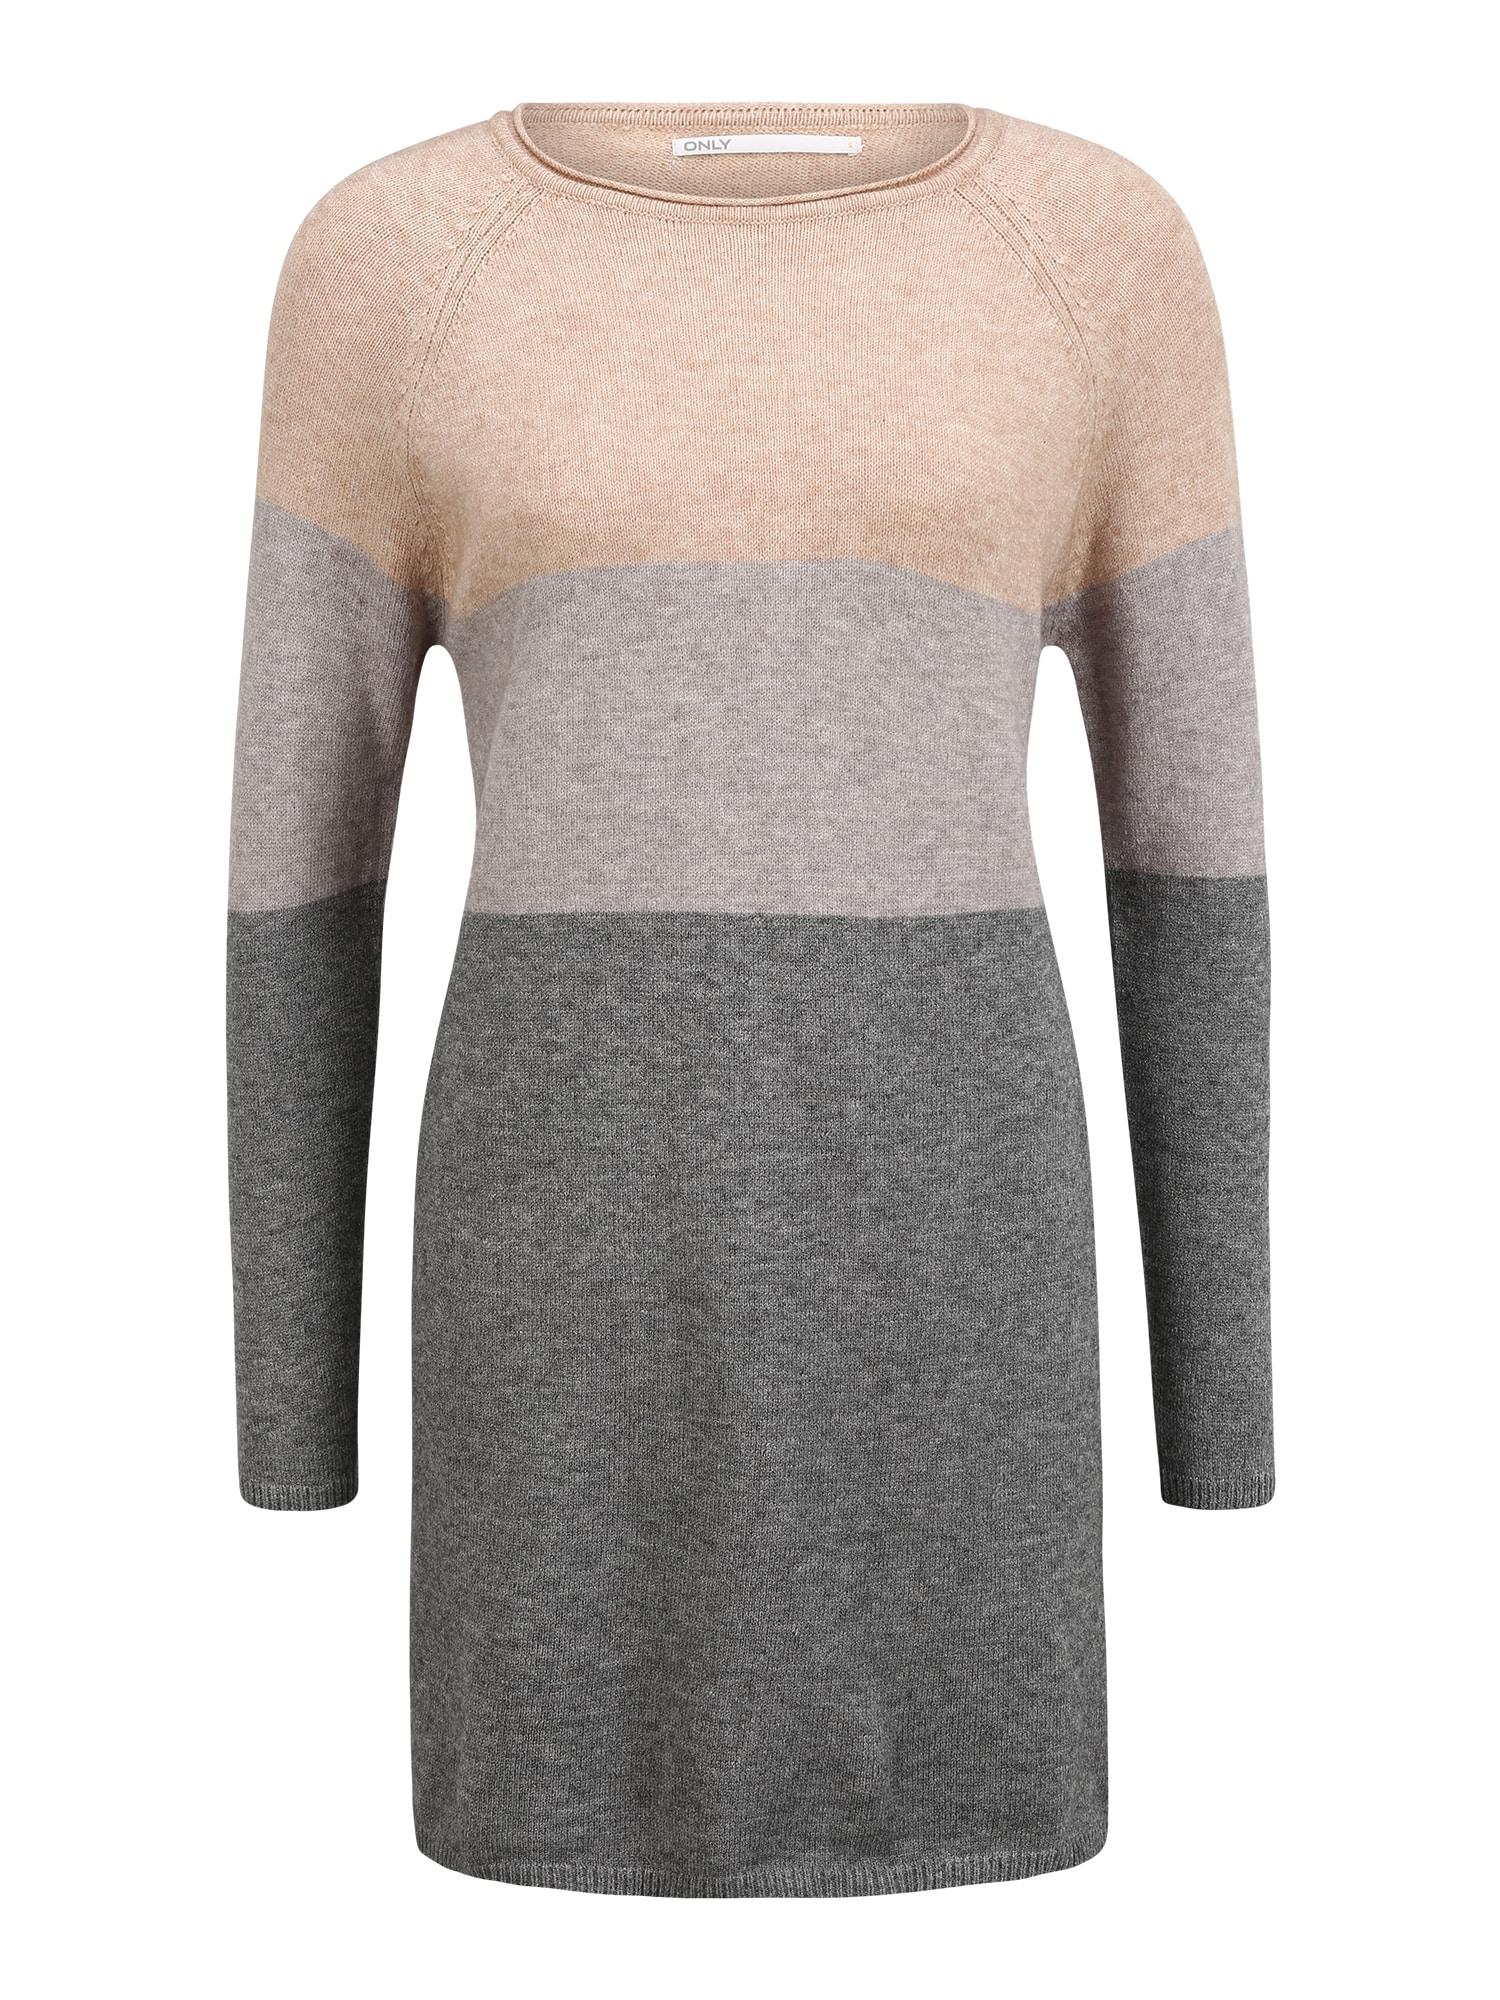 Only (Petite) Megzta suknelė